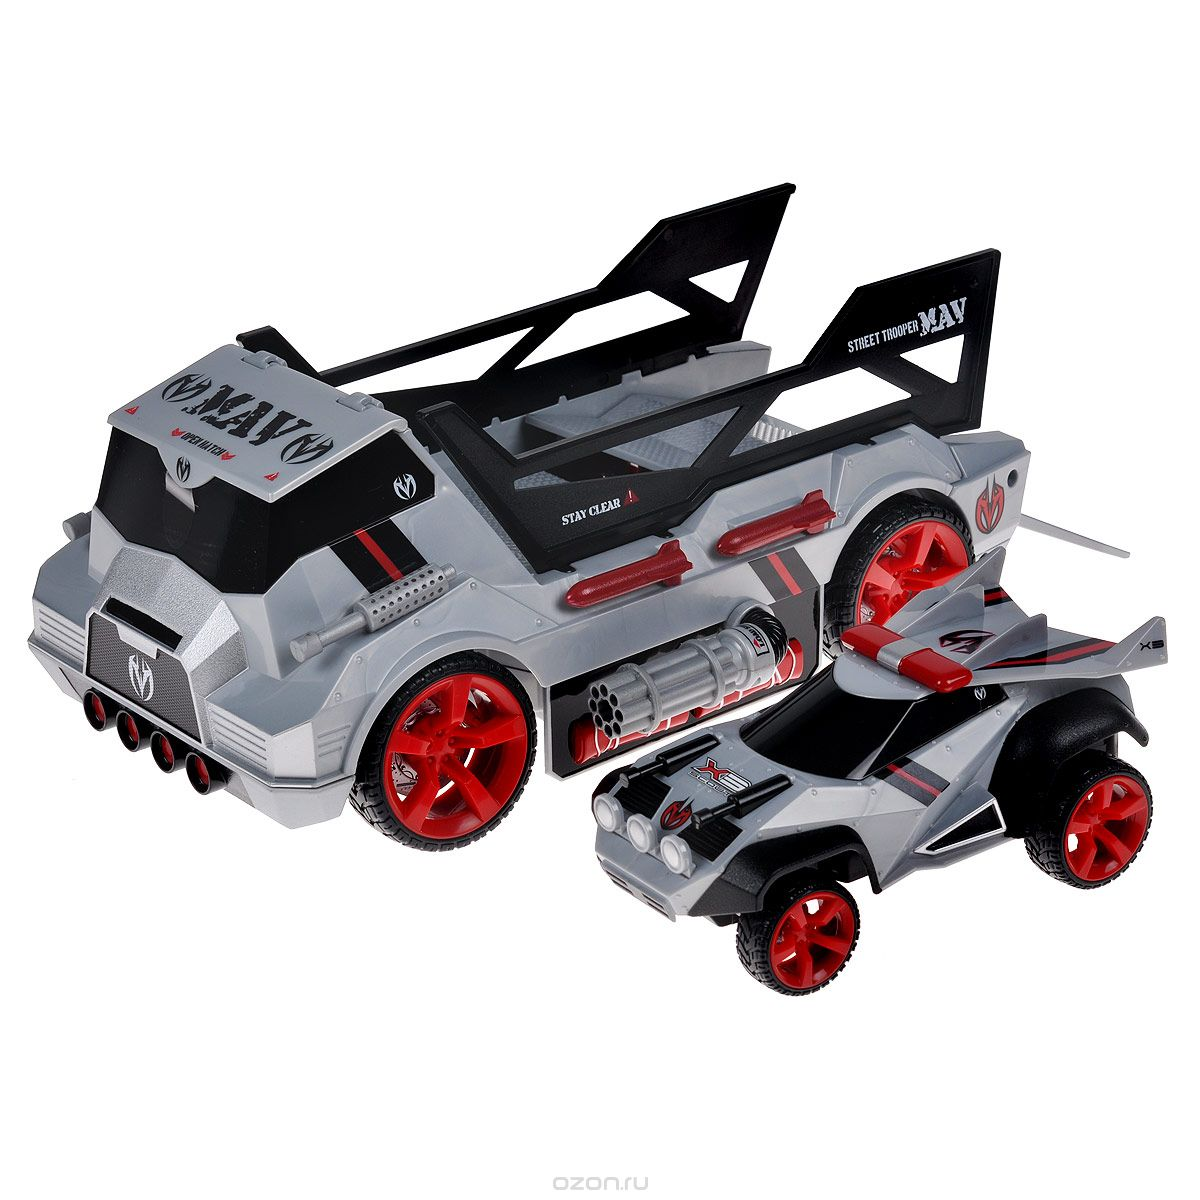 Maisto Машина на радиоуправлении Menace Hauler + Scout X3 цвет серый